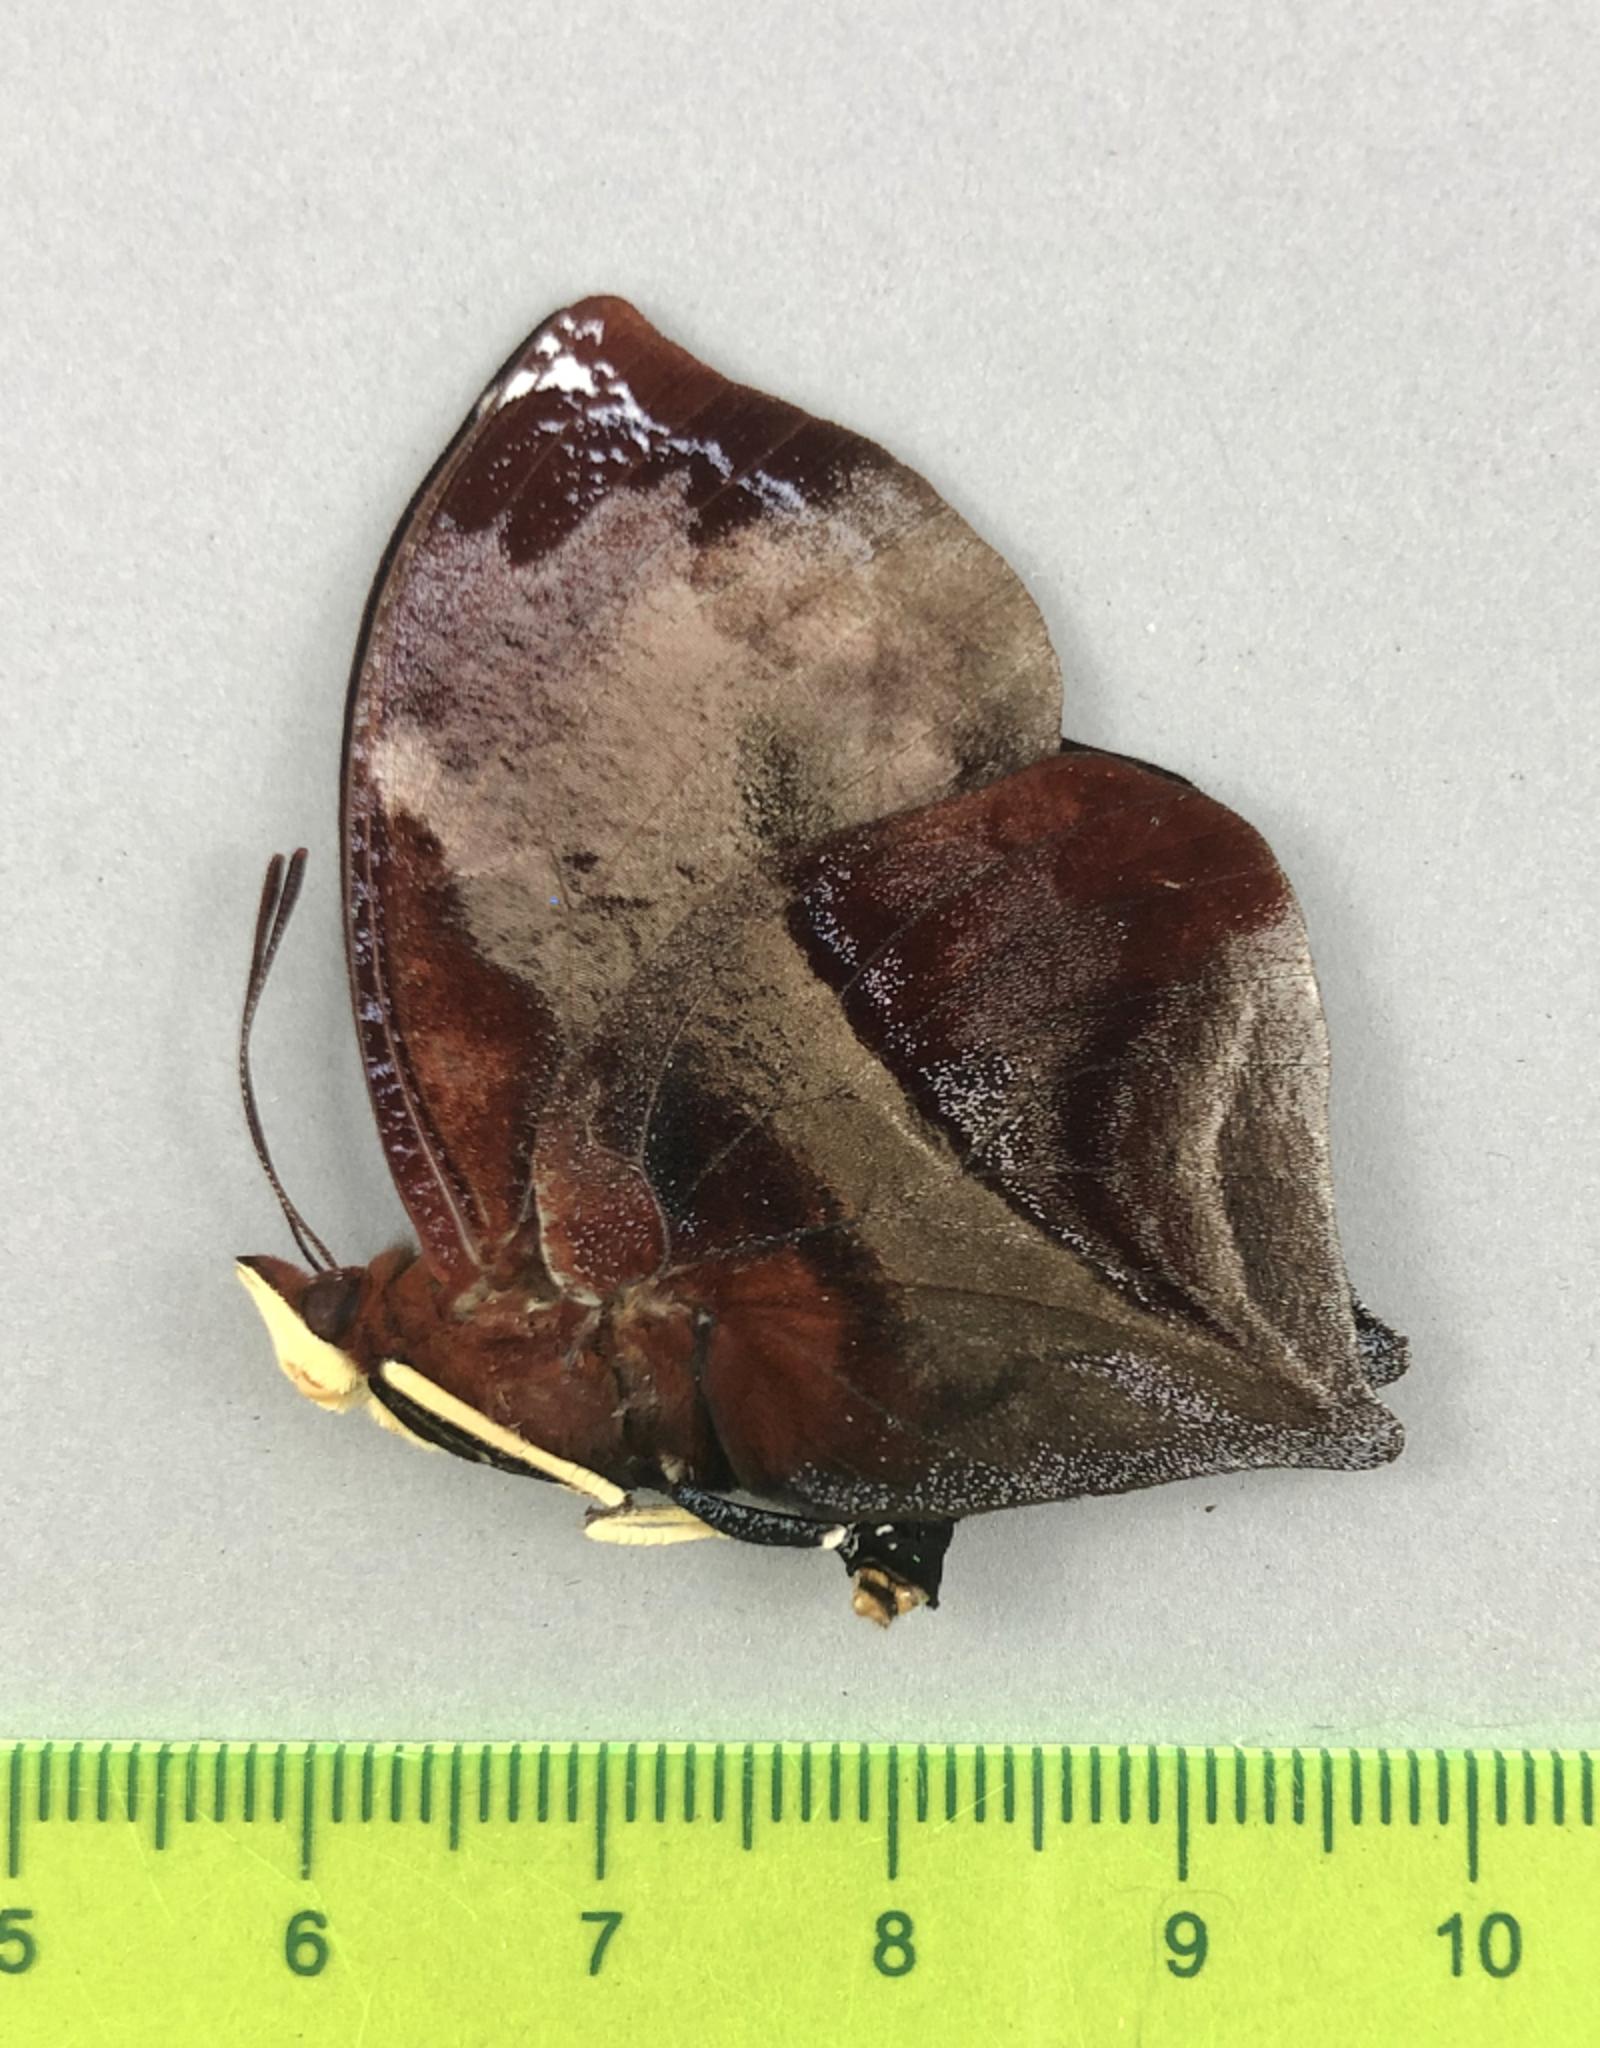 Siderone galanthis M A1 Satipo, Peru